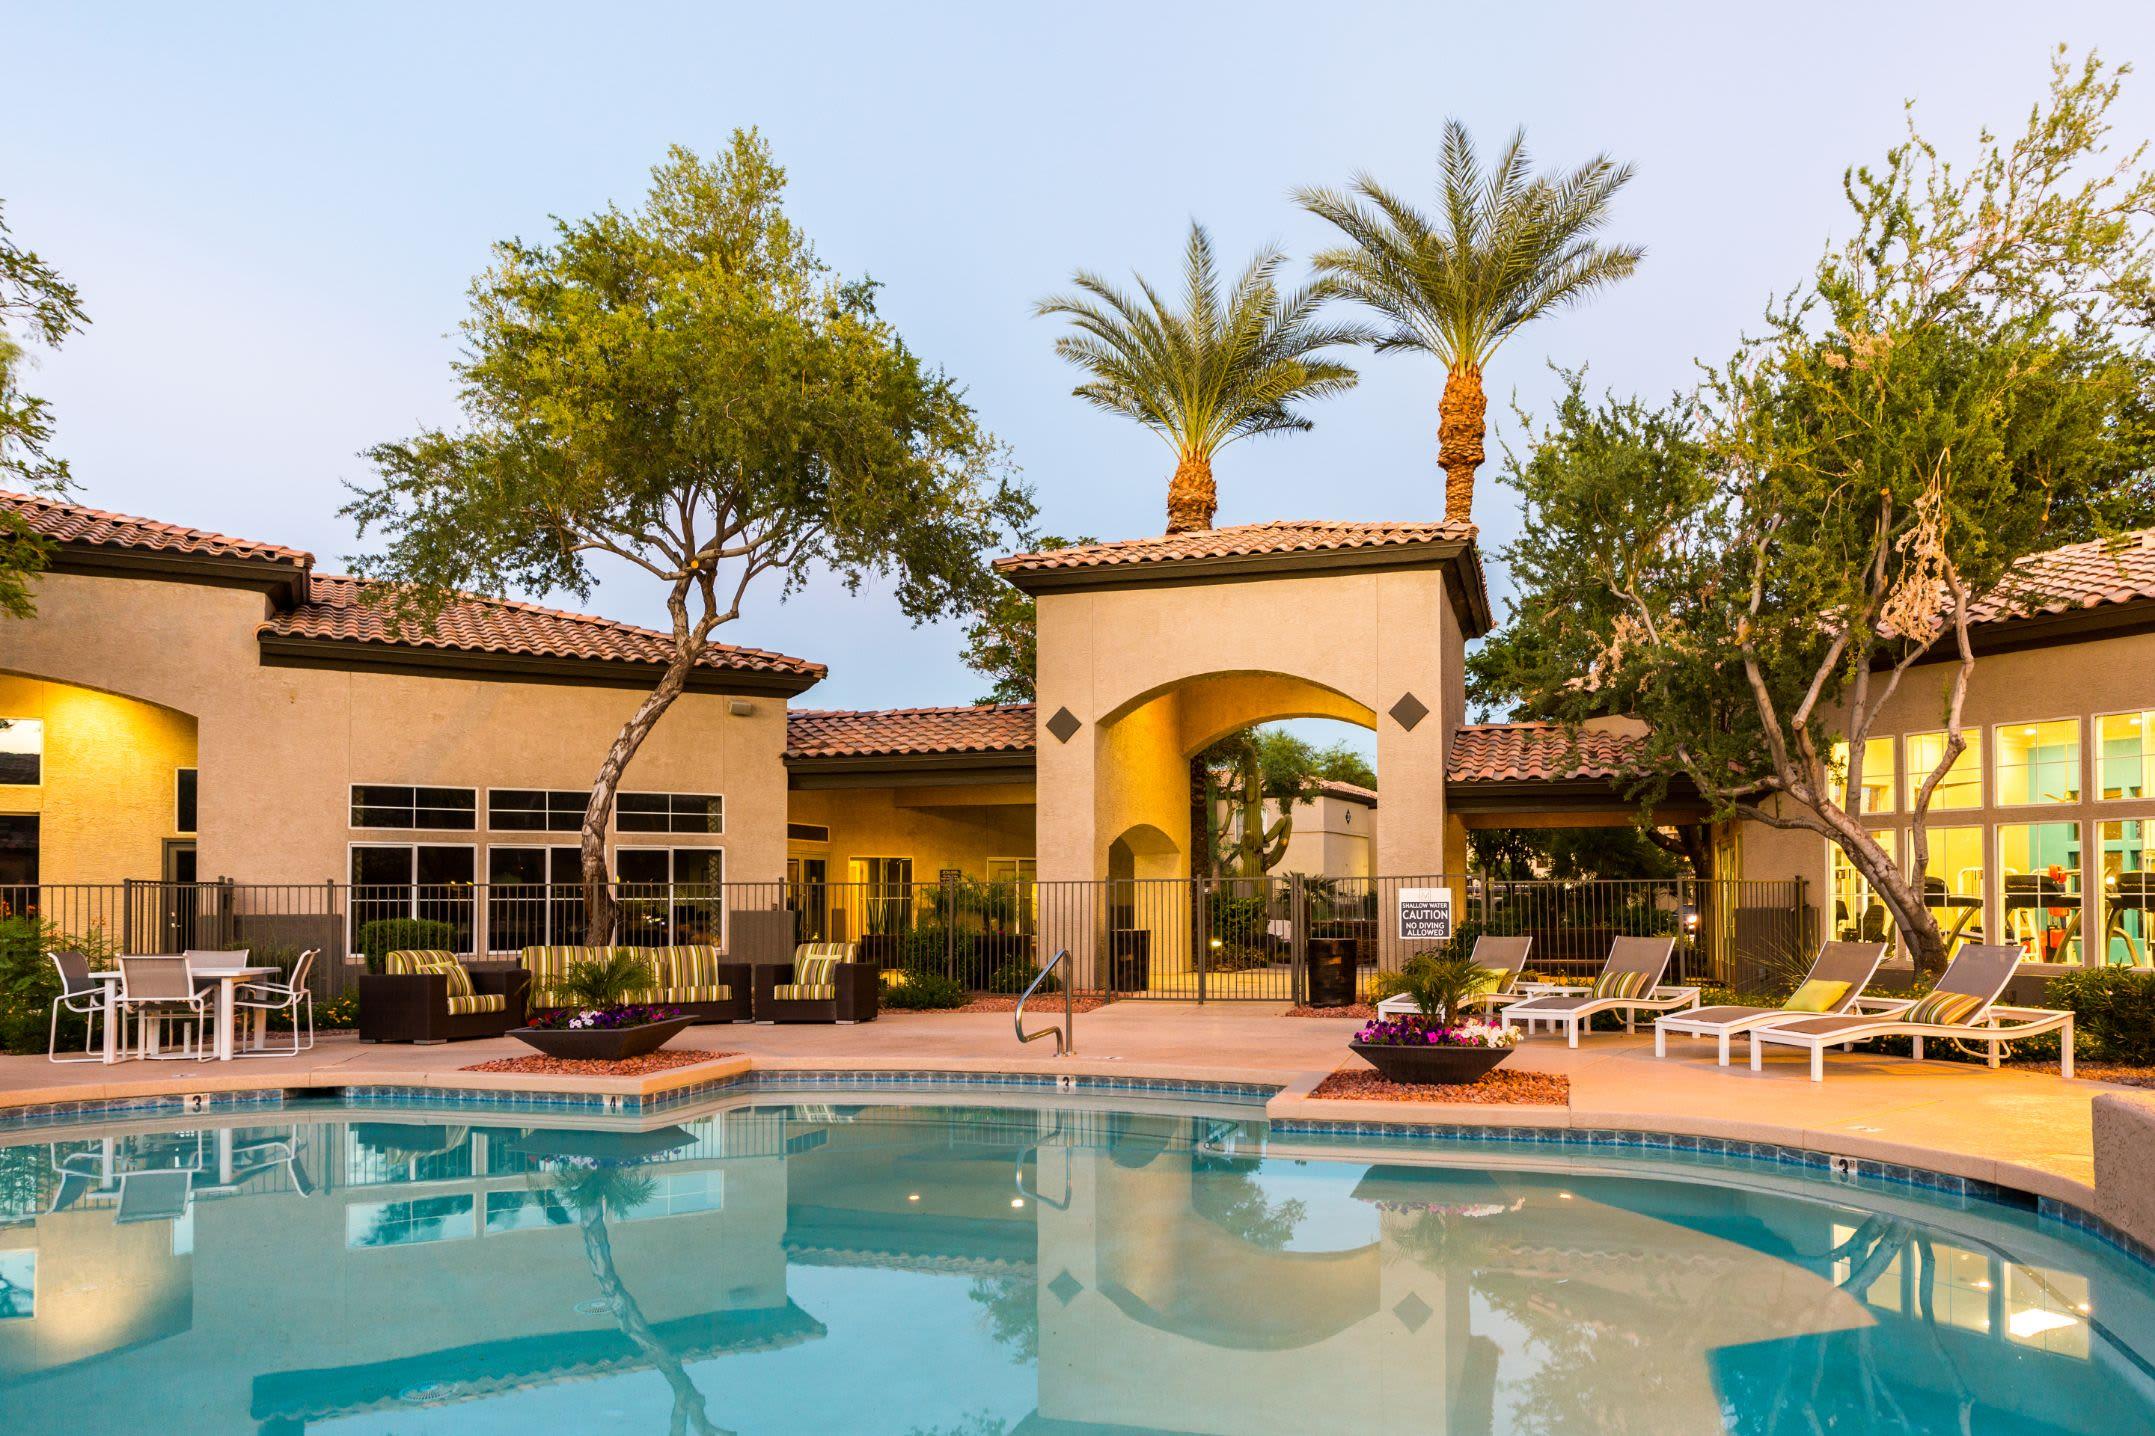 Sparkling pool at Marquis at Arrowhead in Peoria, Arizona